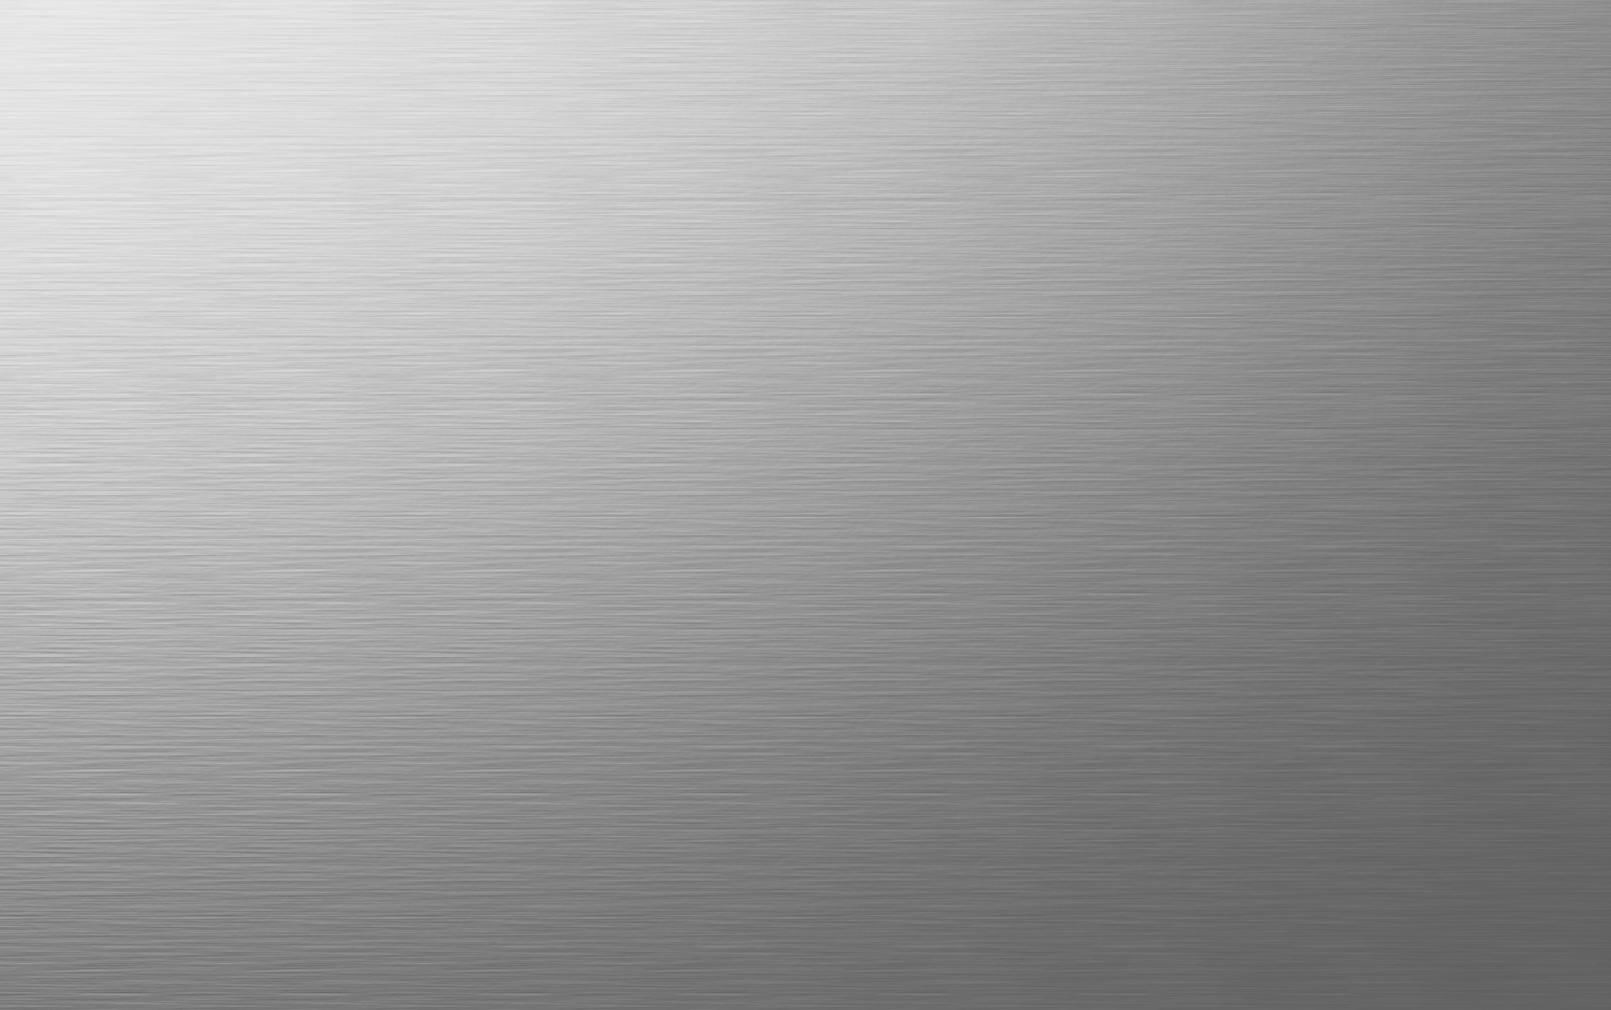 Brushed Aluminum Wallpapers 1611x1010